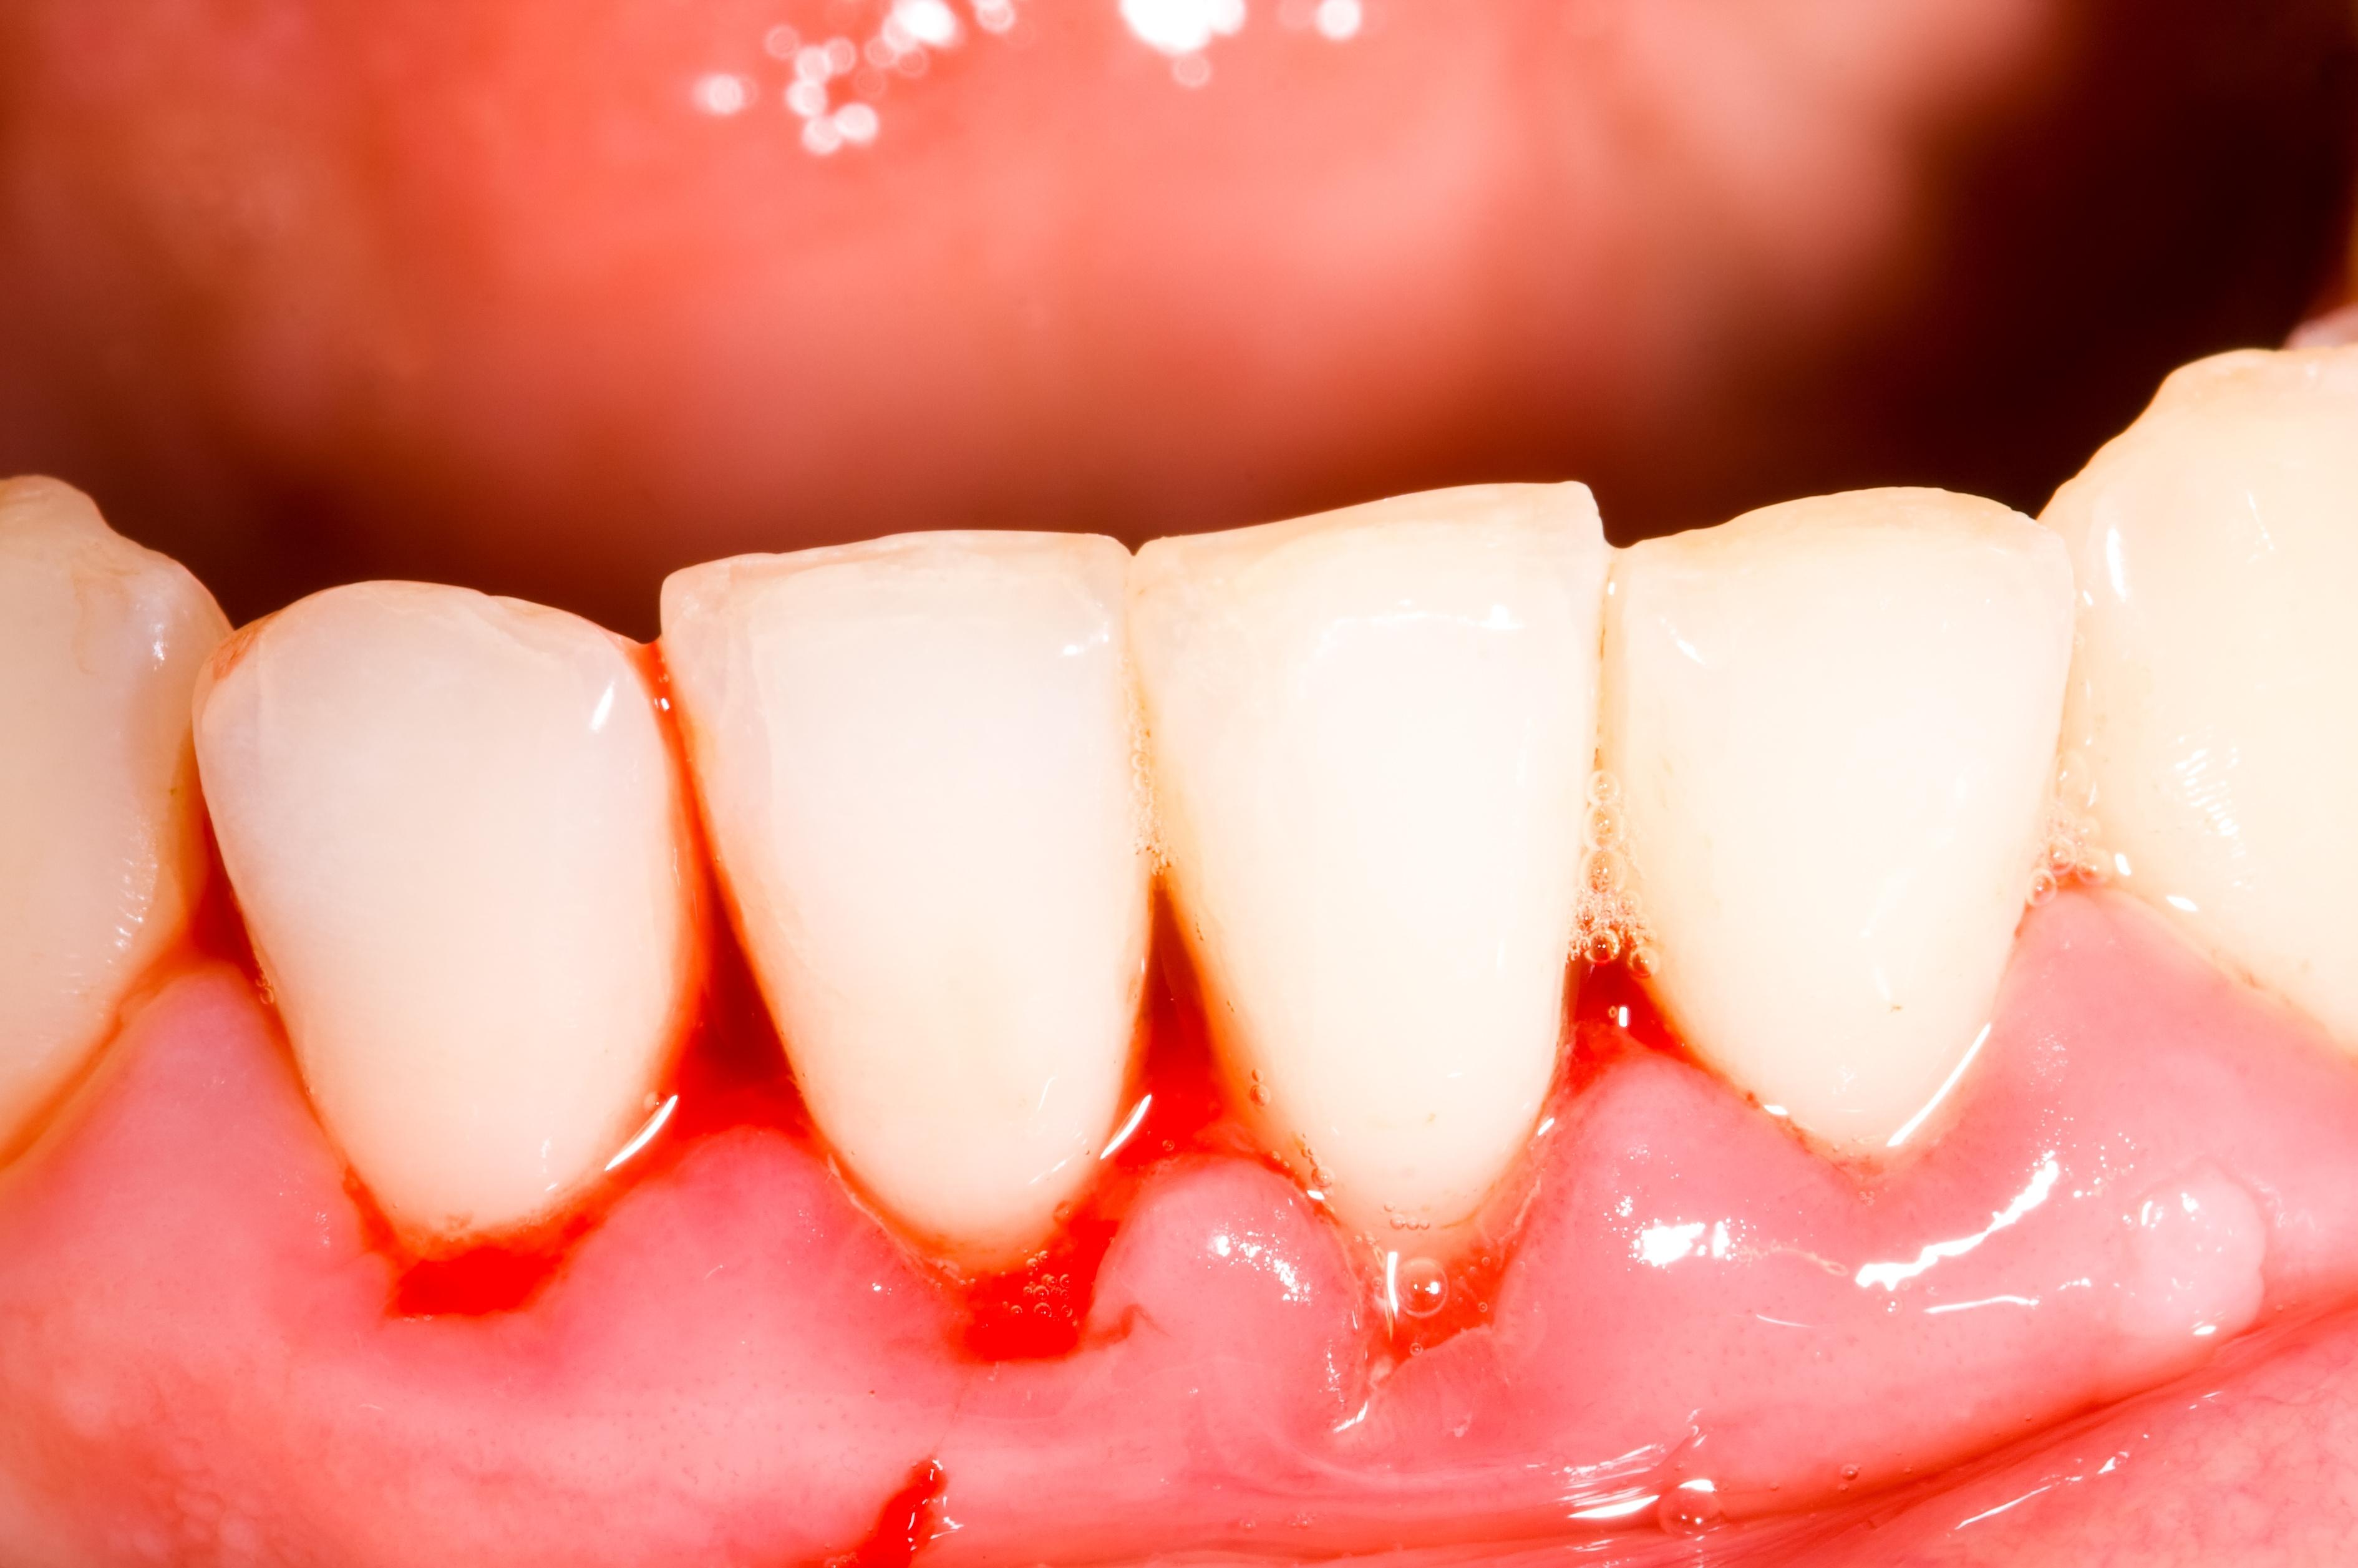 Tooth bleeding